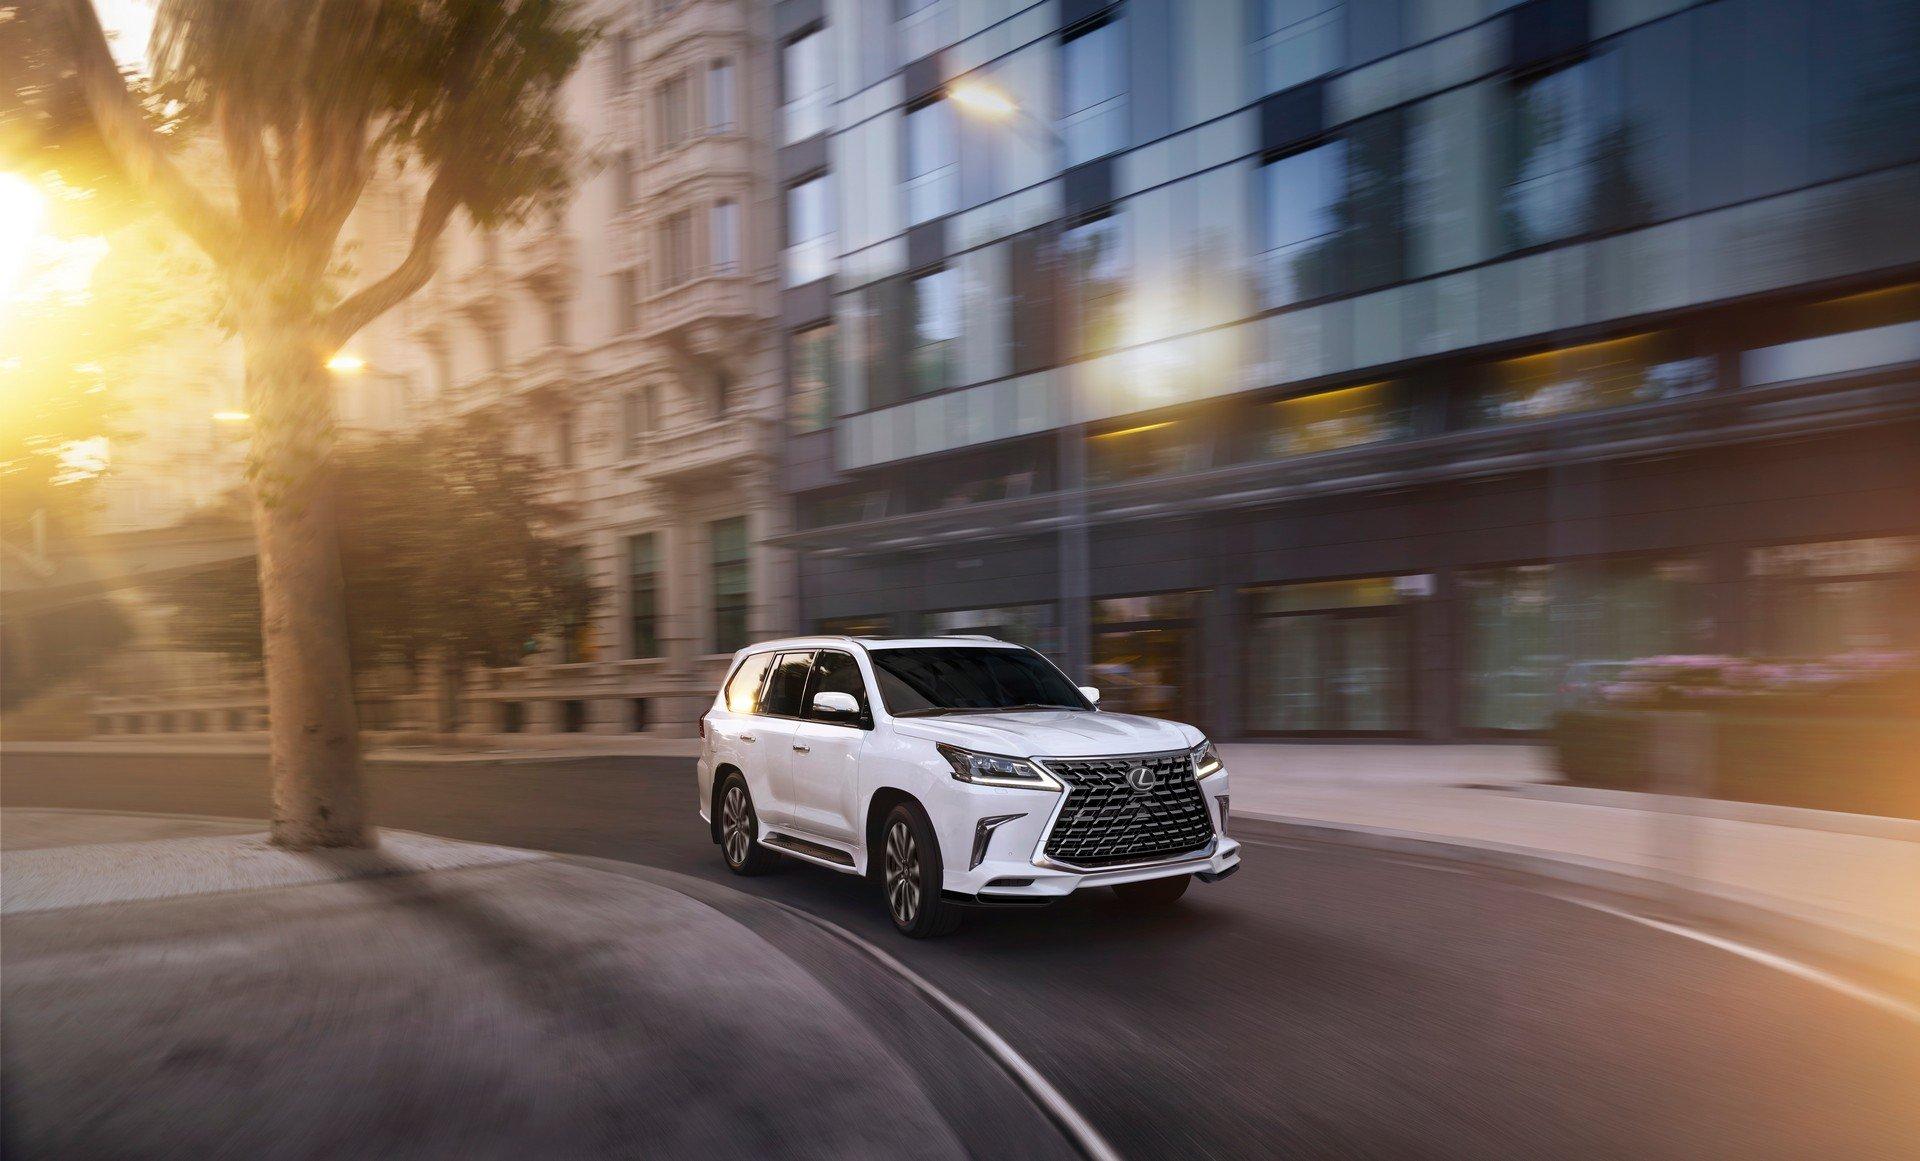 2021 Lexus LX 570 Ratings